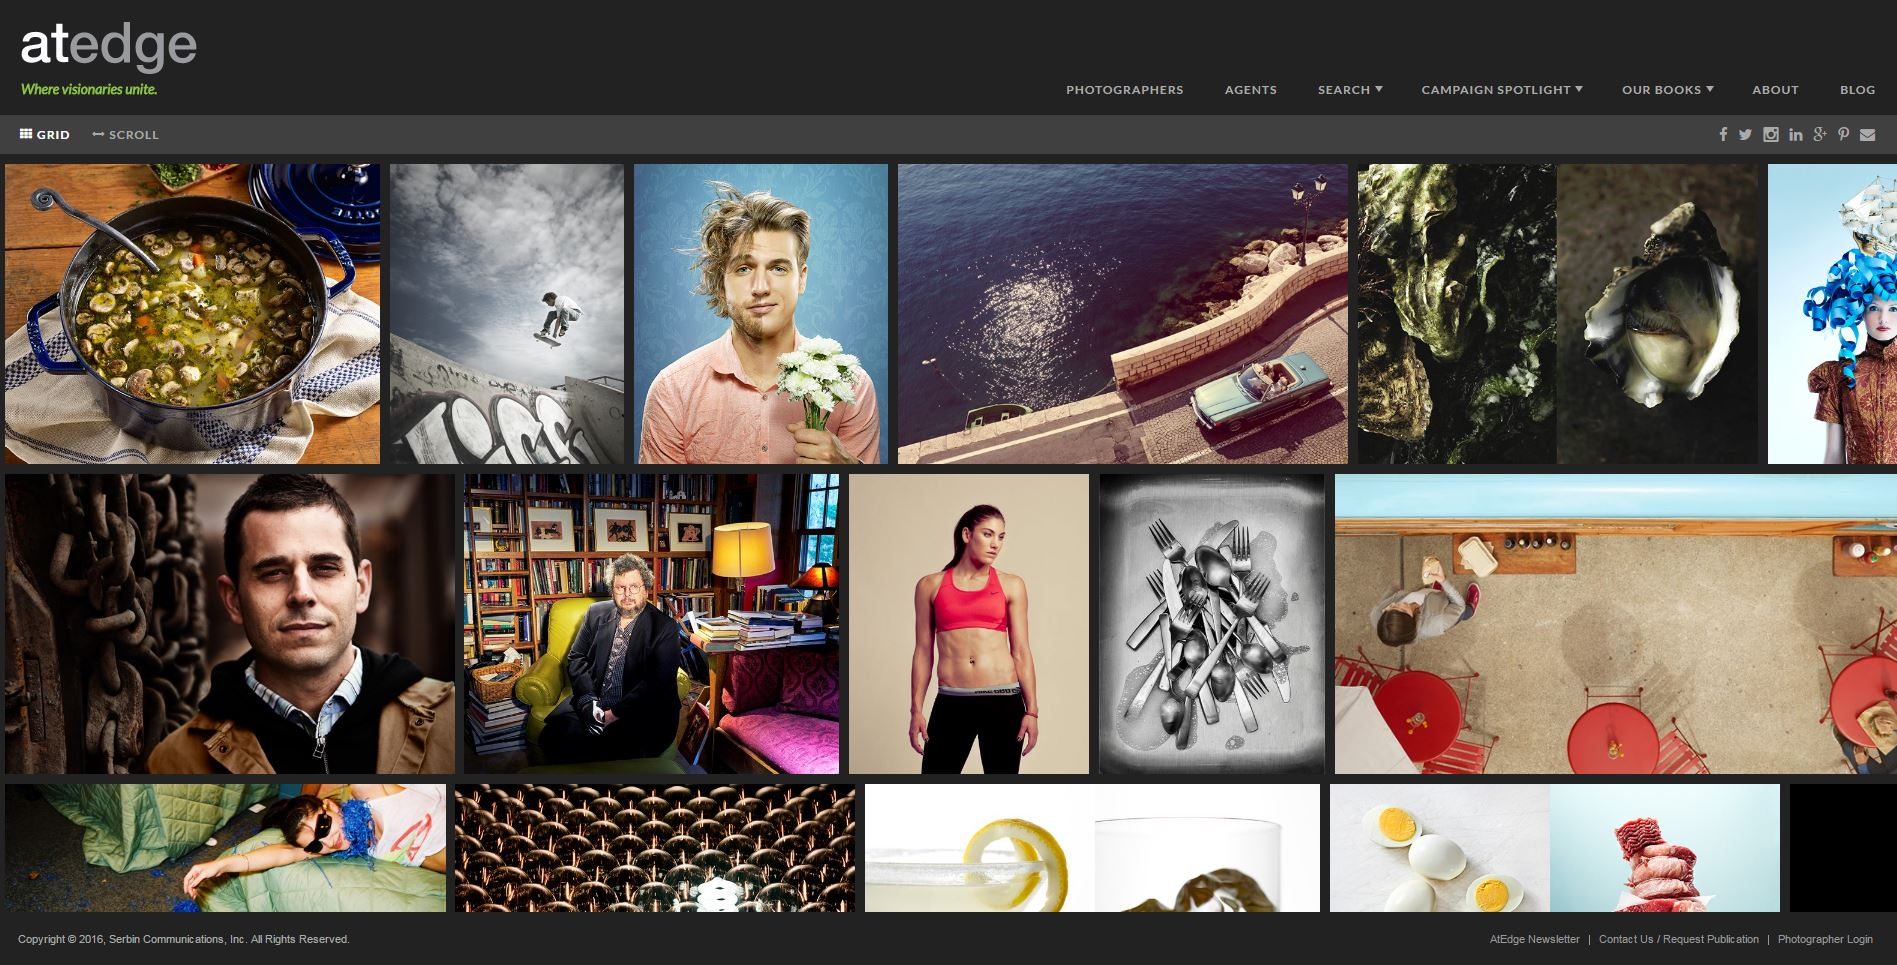 newwebdesign